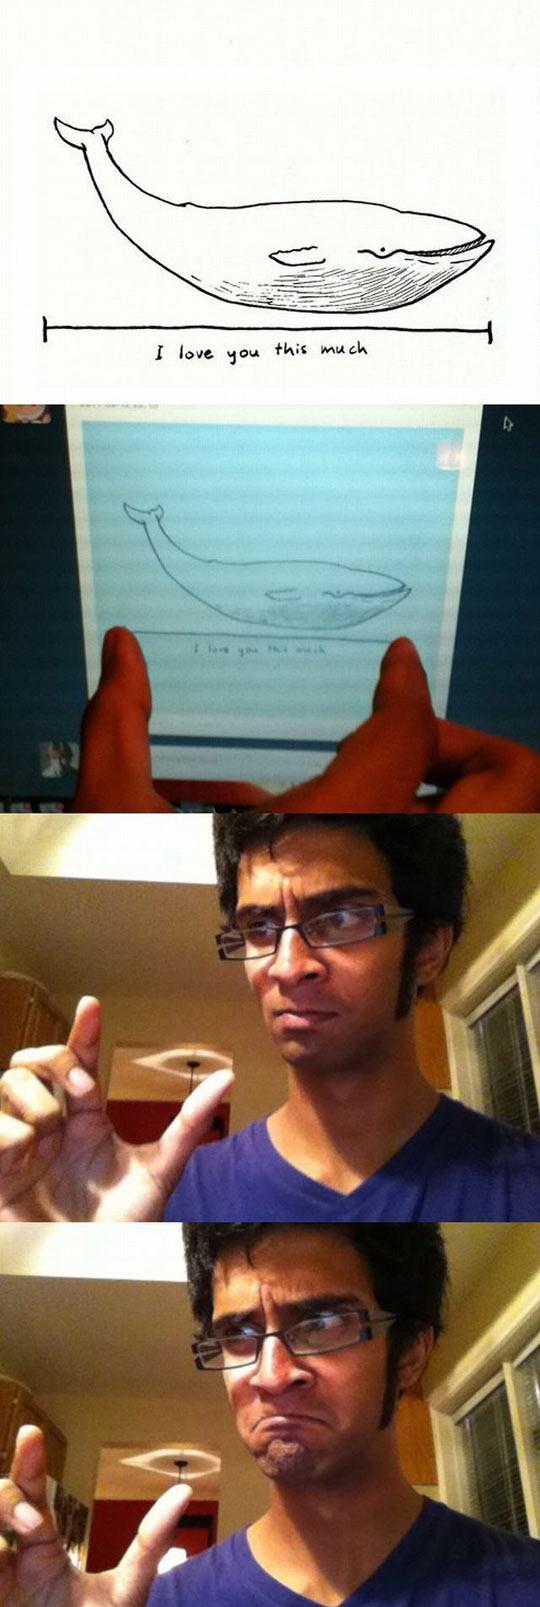 funny-whale-size-computer-image-sad